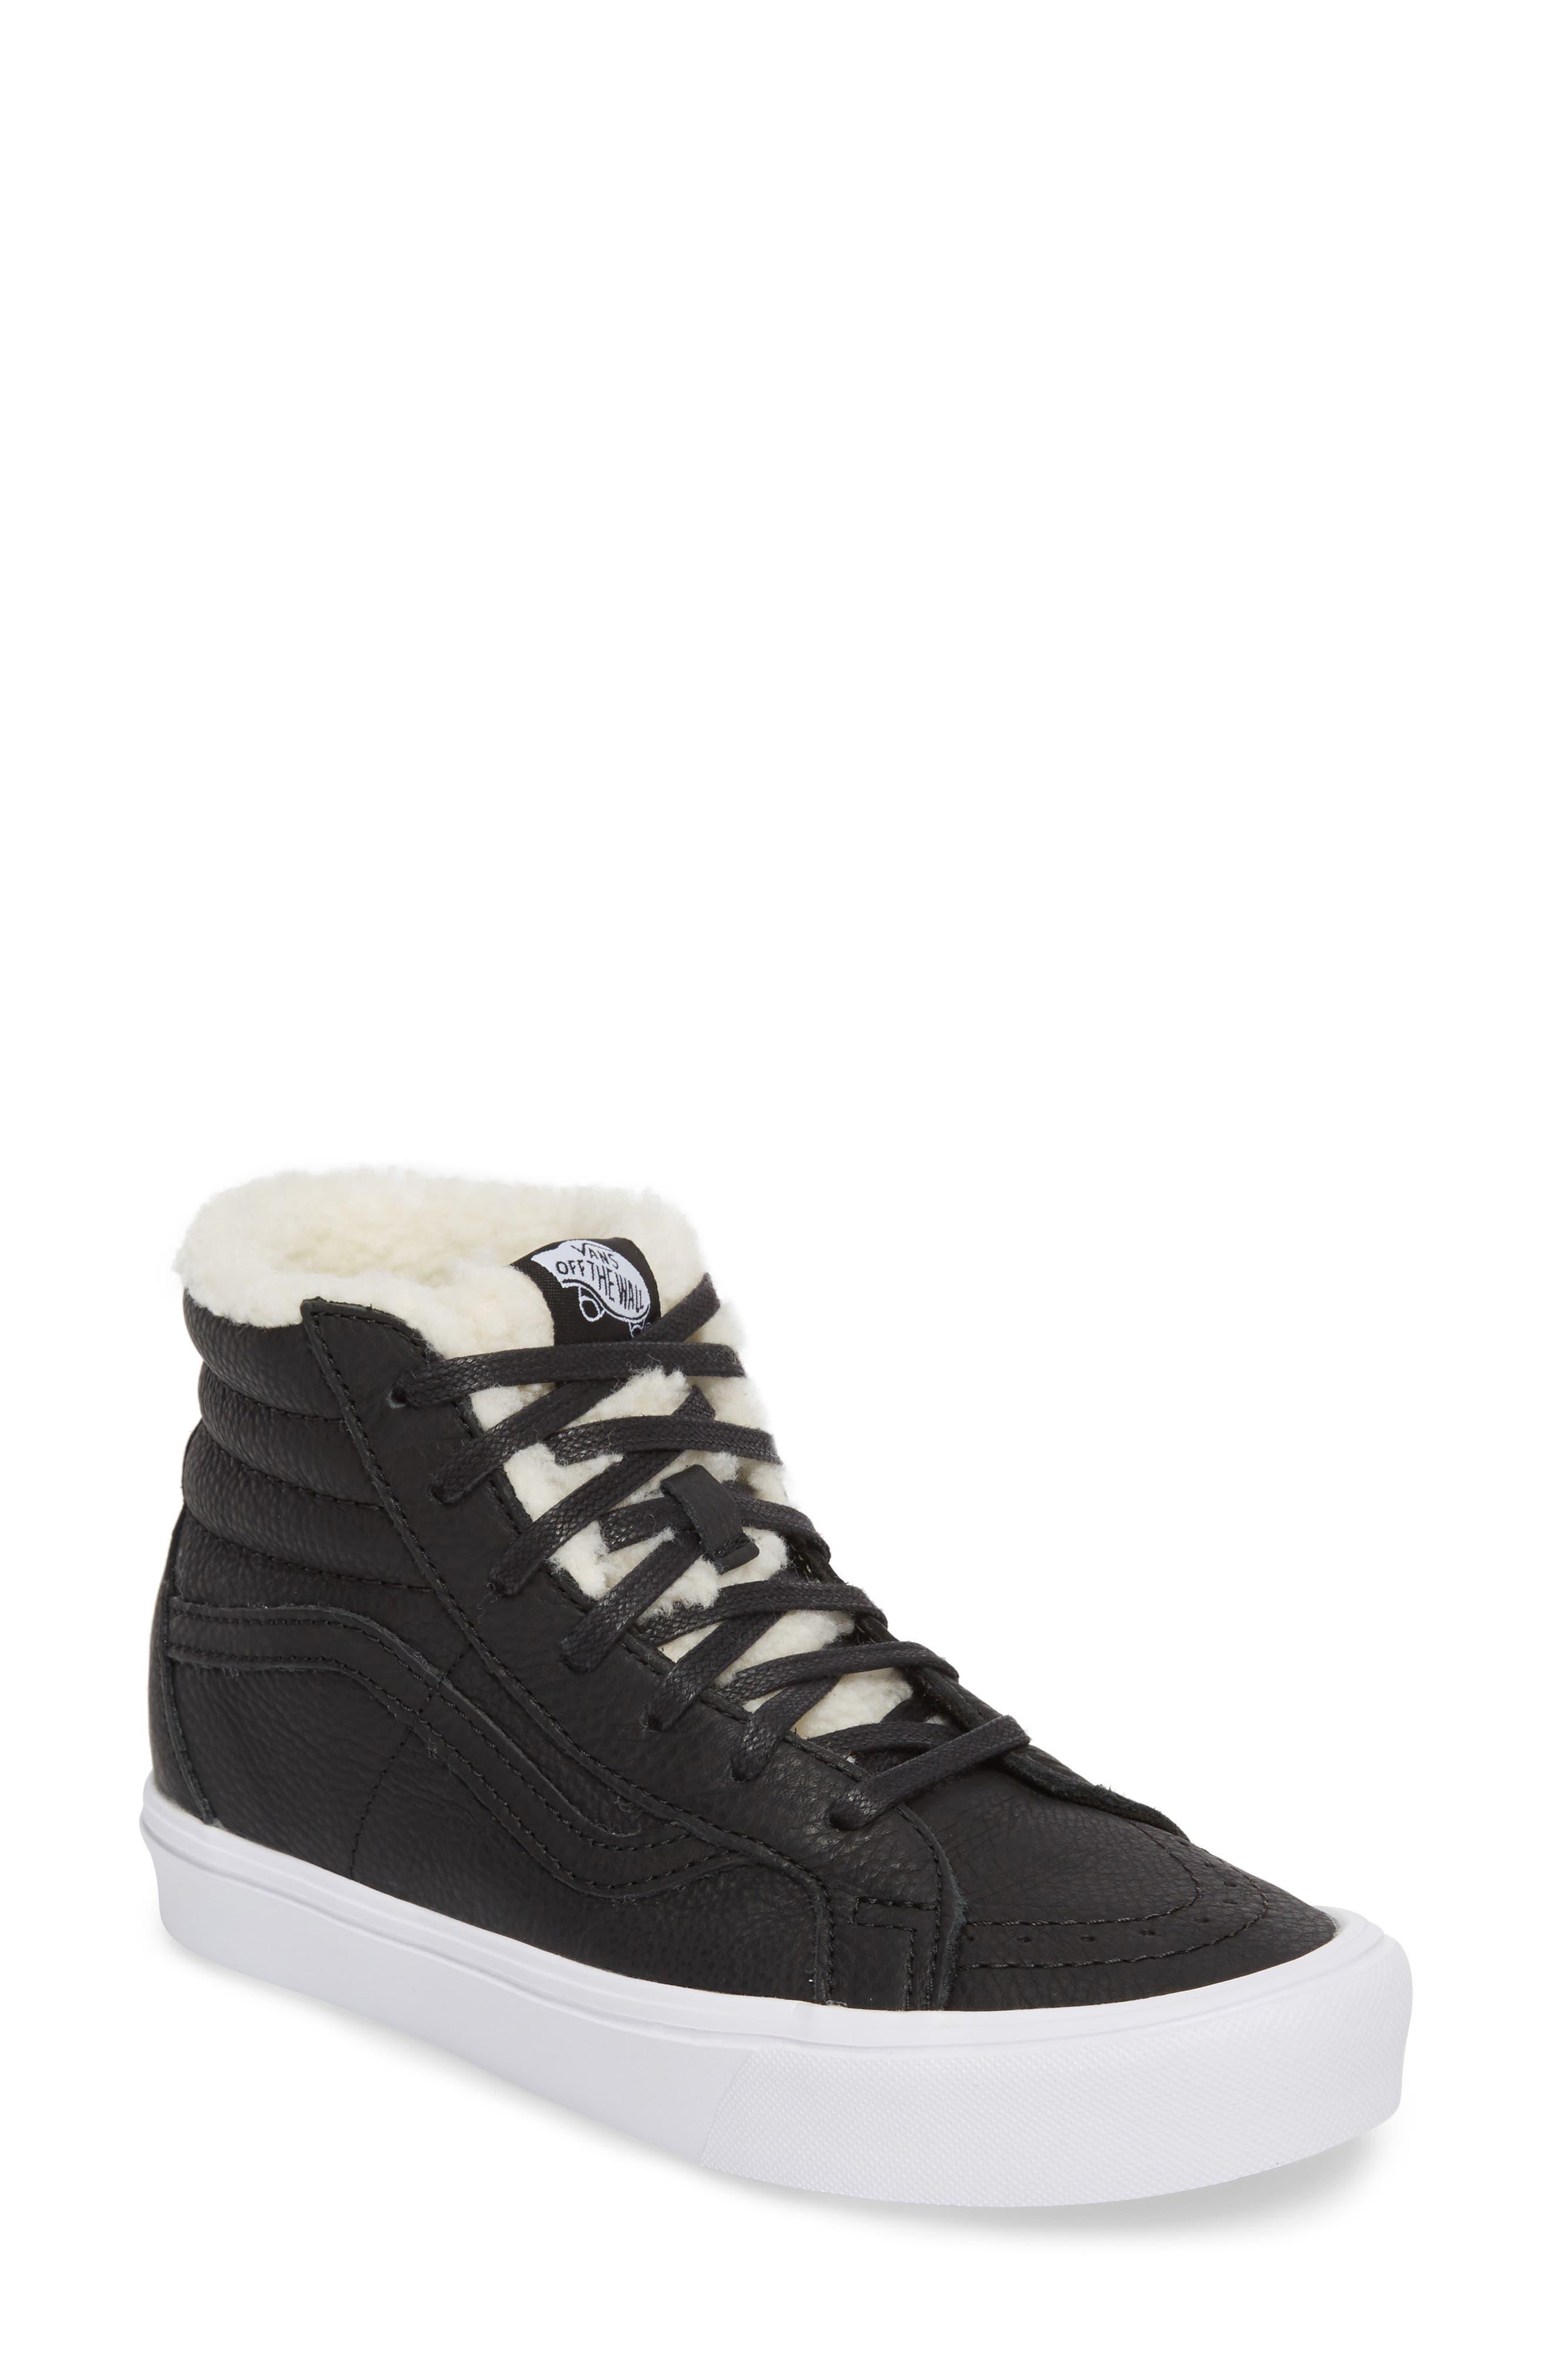 Sk8-Hi Reissue Lite High Top Sneaker,                             Main thumbnail 1, color,                             001